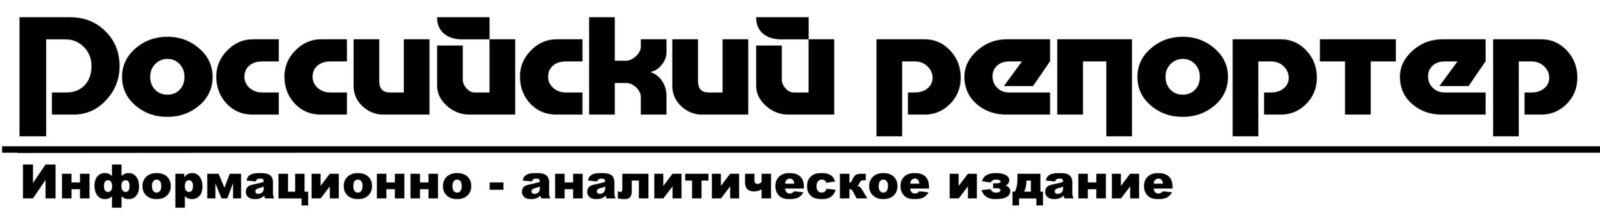 Российский репортер